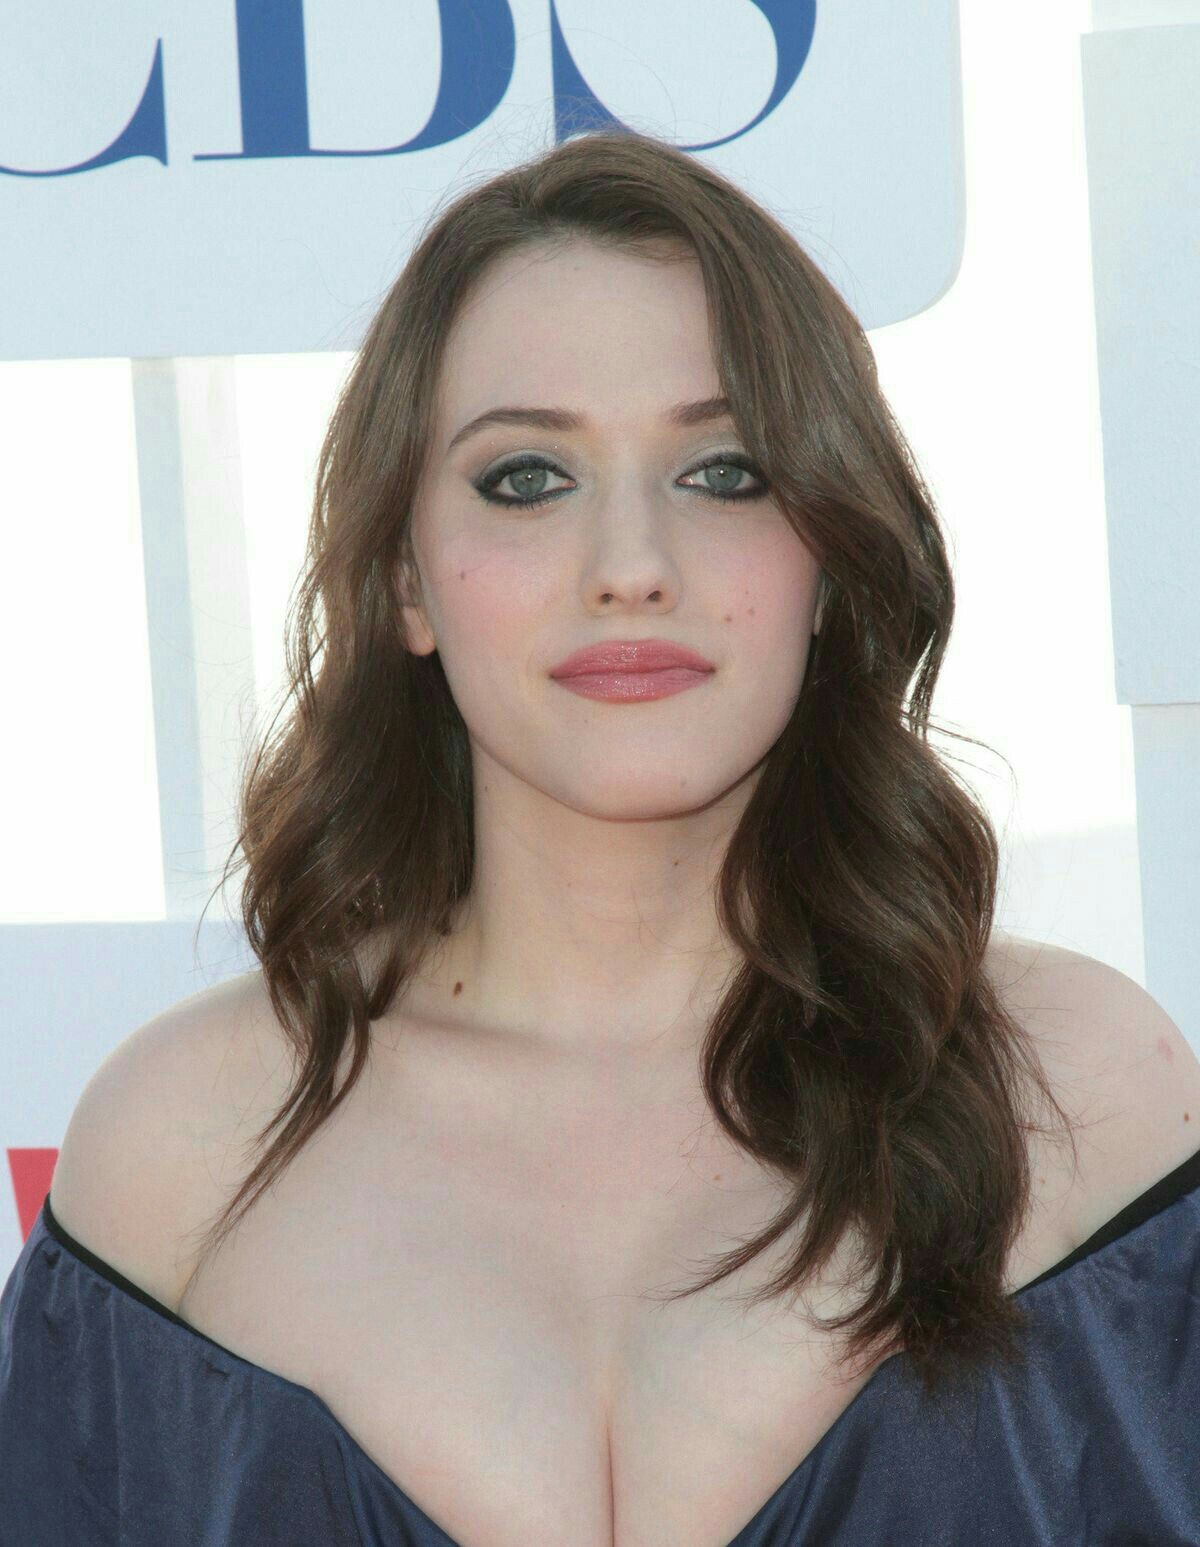 Pin By Reo Gallery On Kat Denning Beautiful Hollywood Actress Photos In 2020 Kat Dennings Beauty Girl Hair Makeup